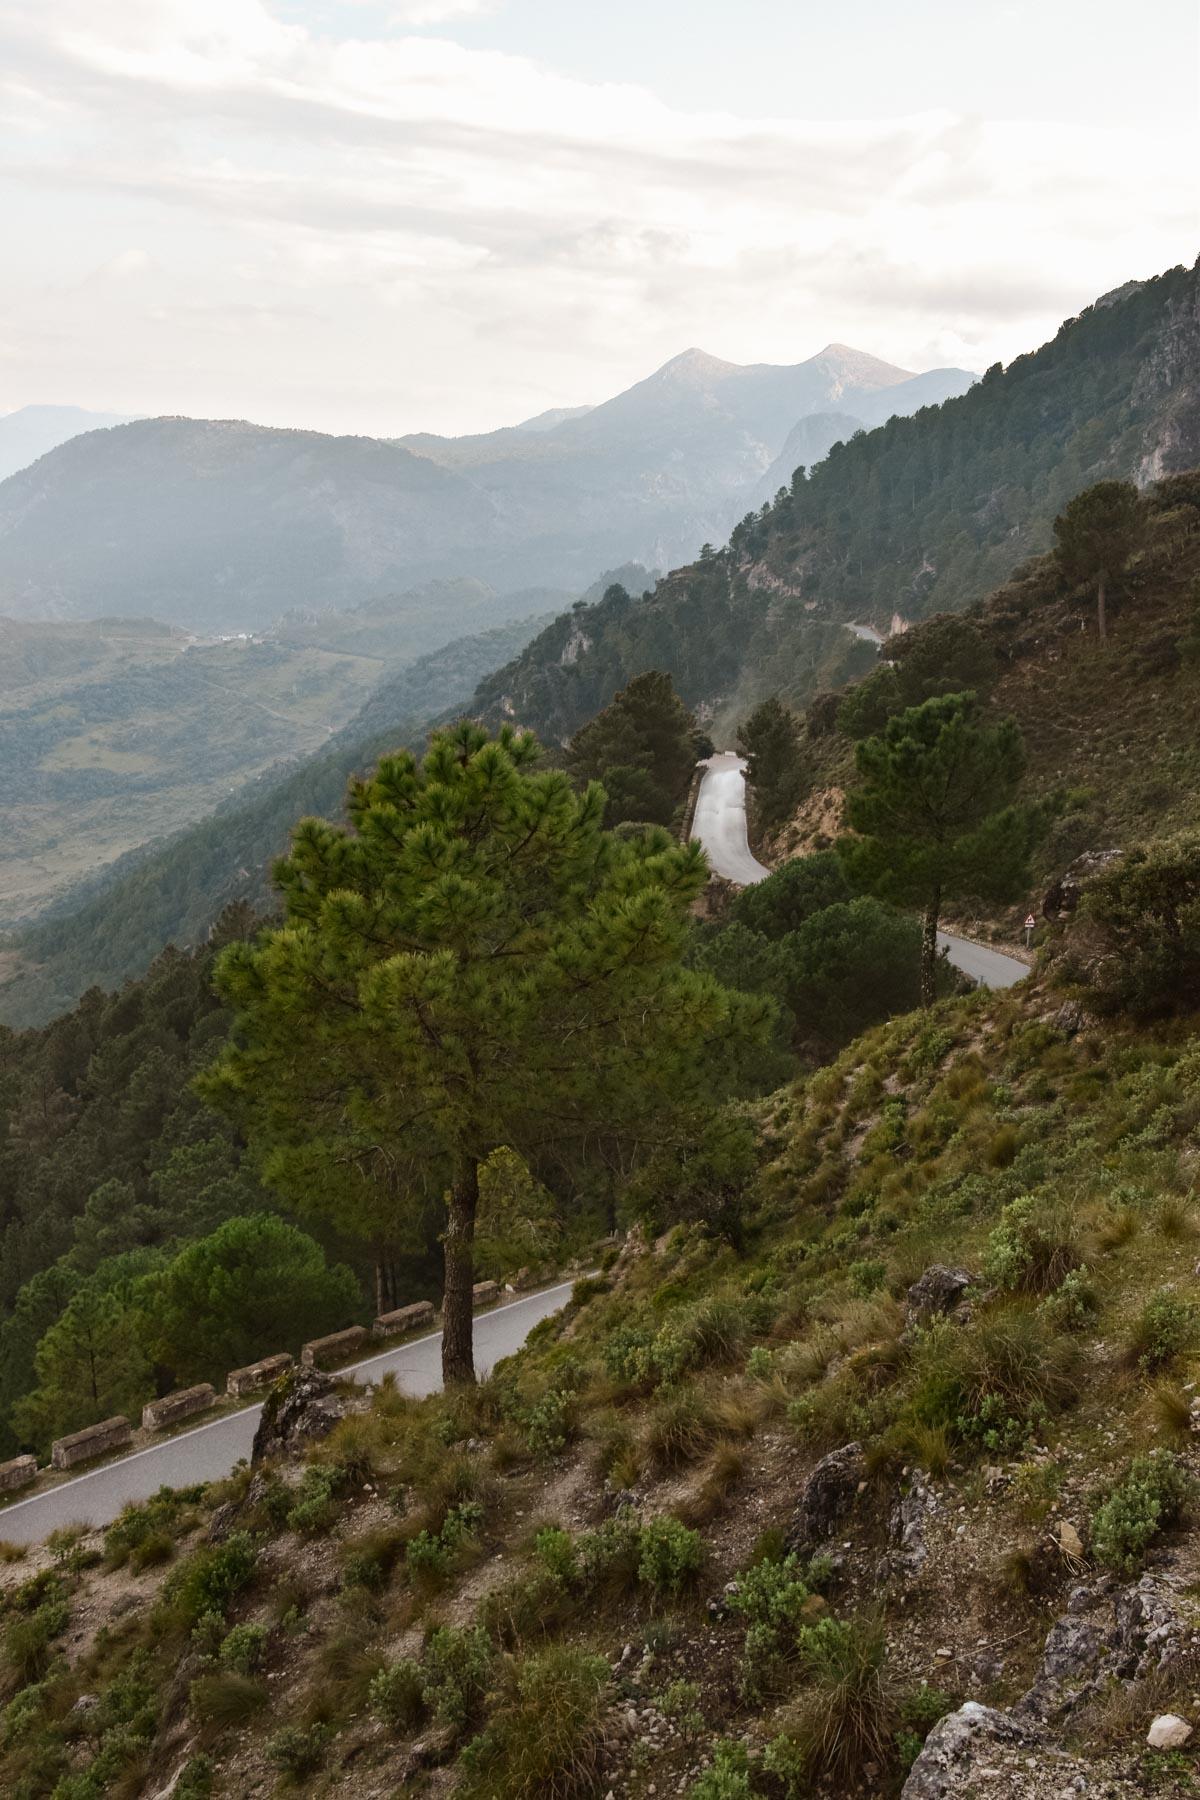 Route sinueuse de la Sierra de Grazalema, Andalousie